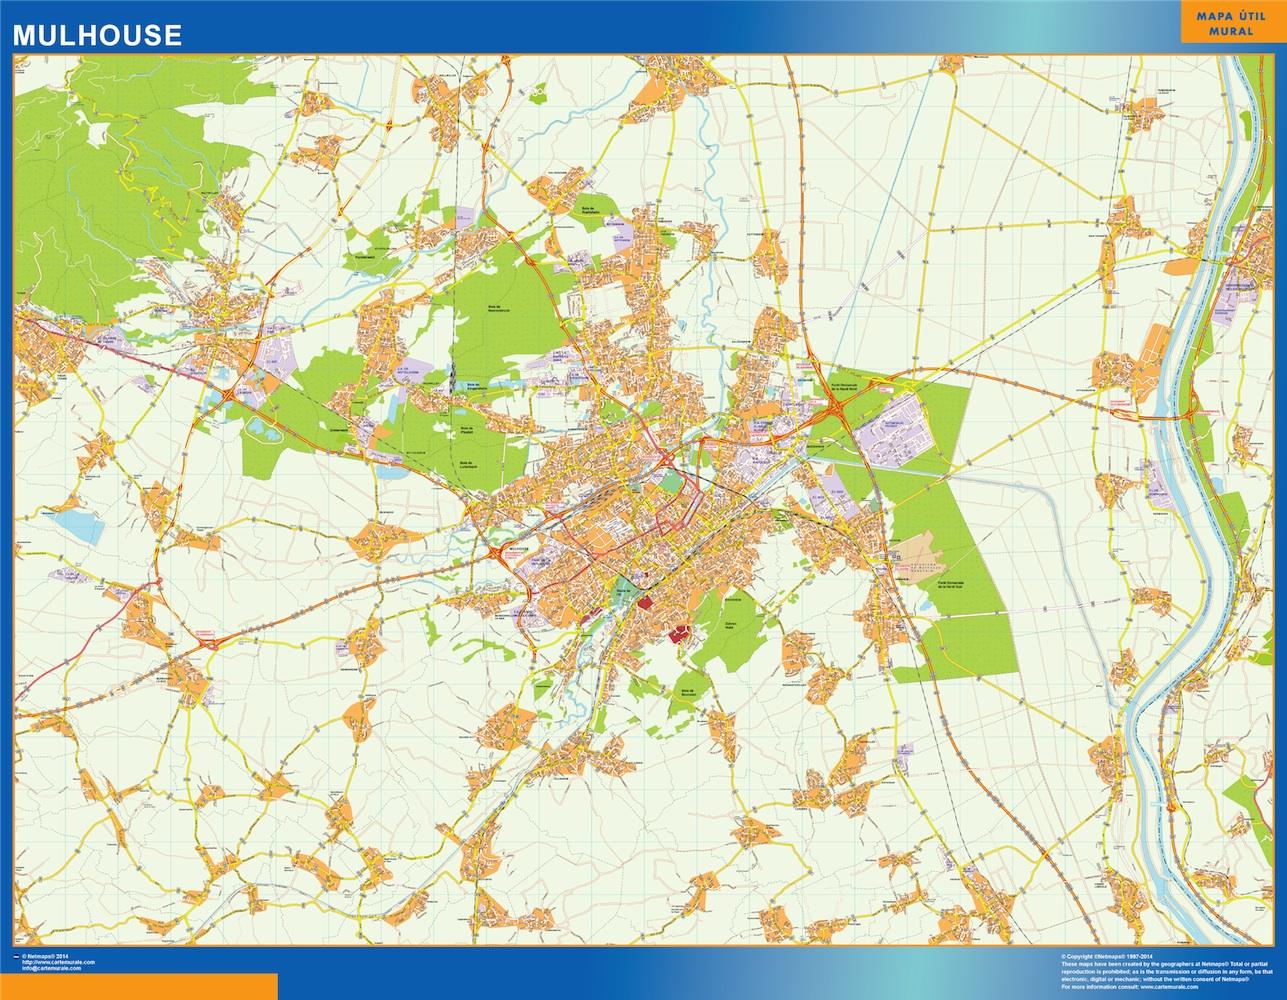 Mapa Mulhouse en Francia plastificado gigante